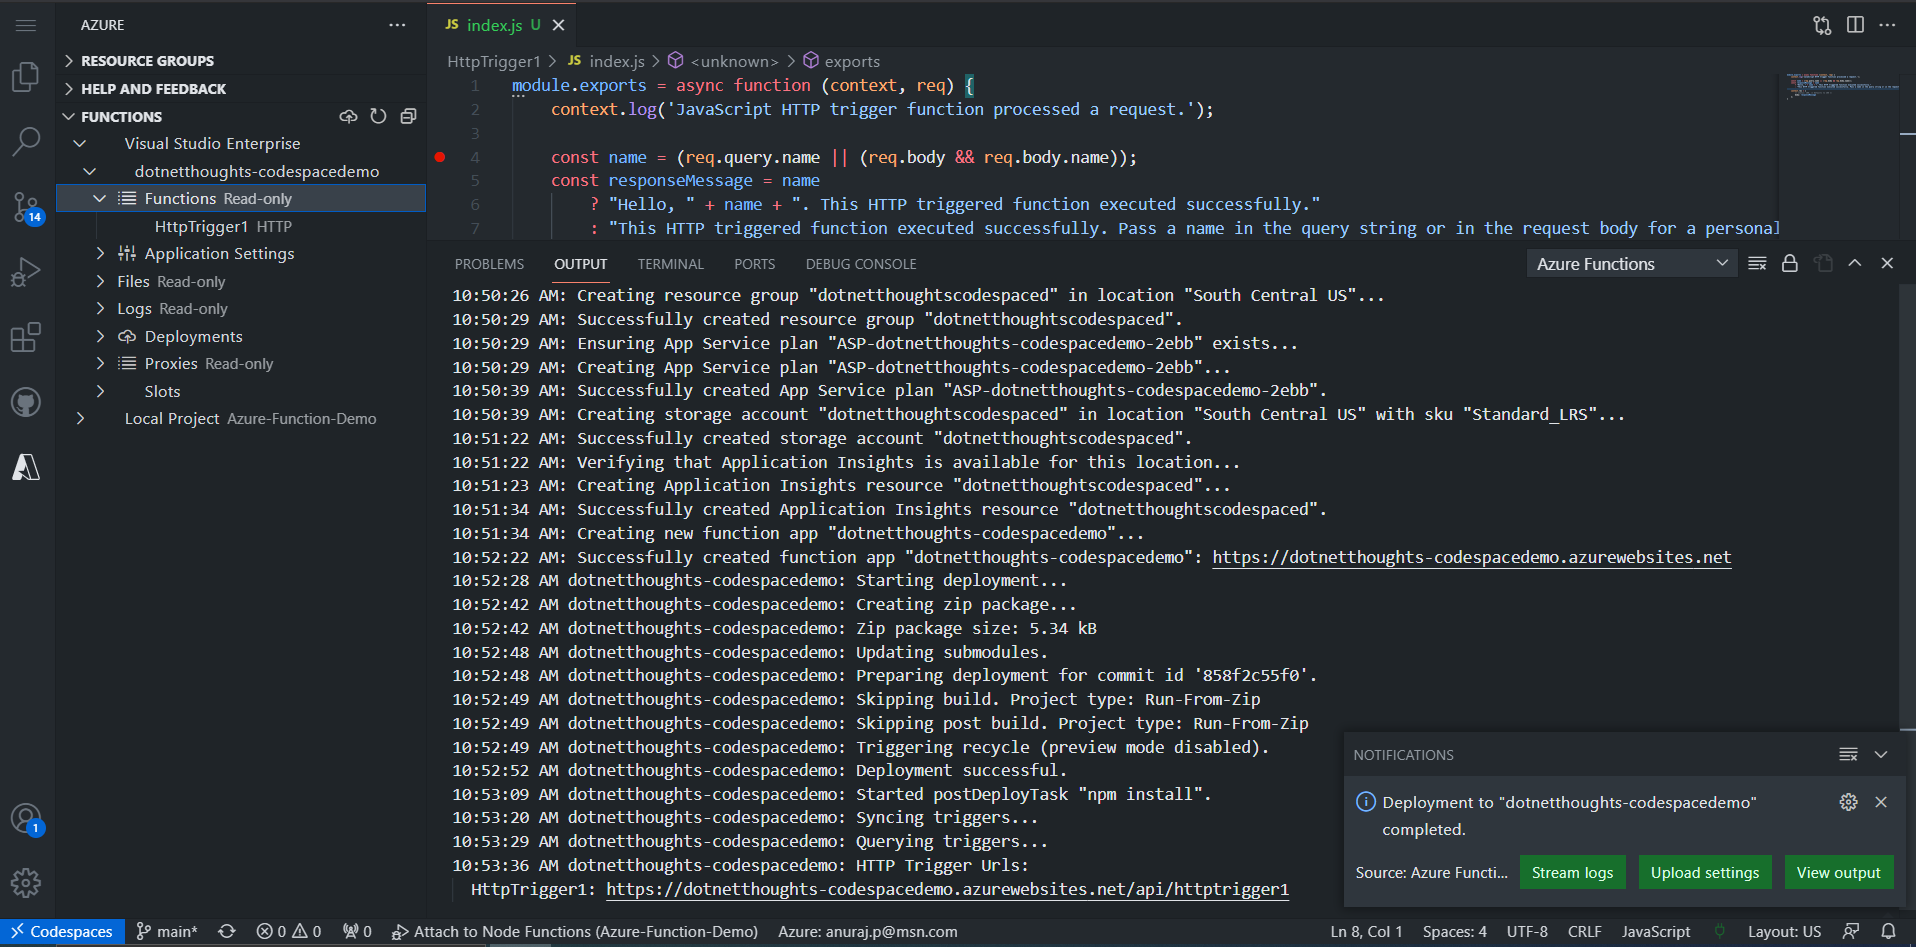 Node JS function deployment completed